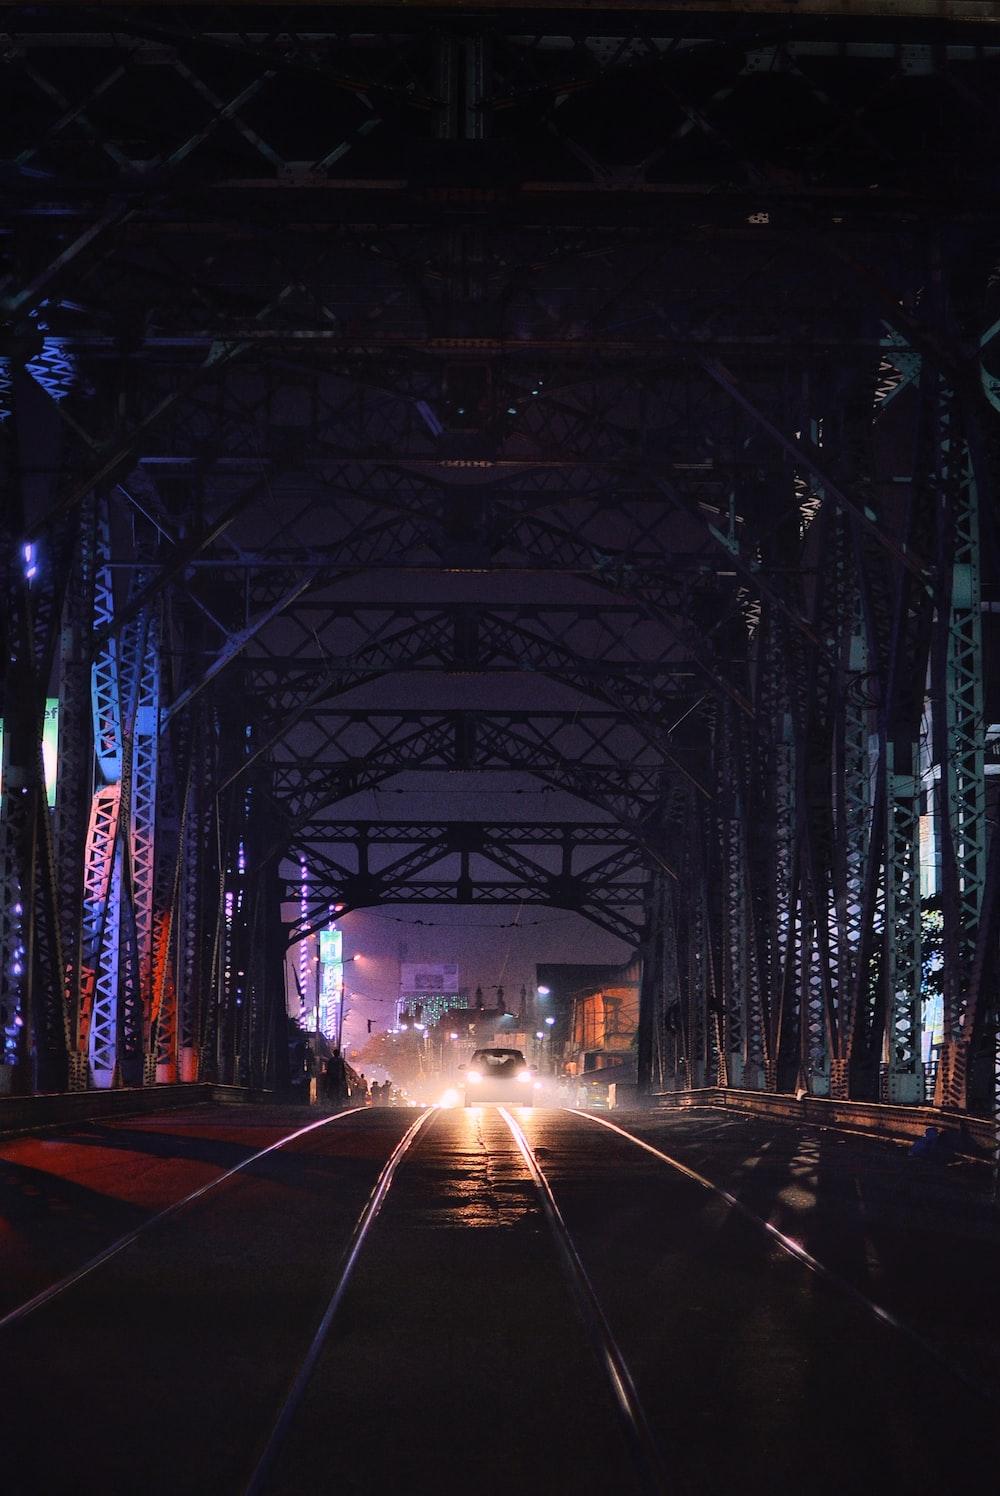 car on road under bridge at nighttime